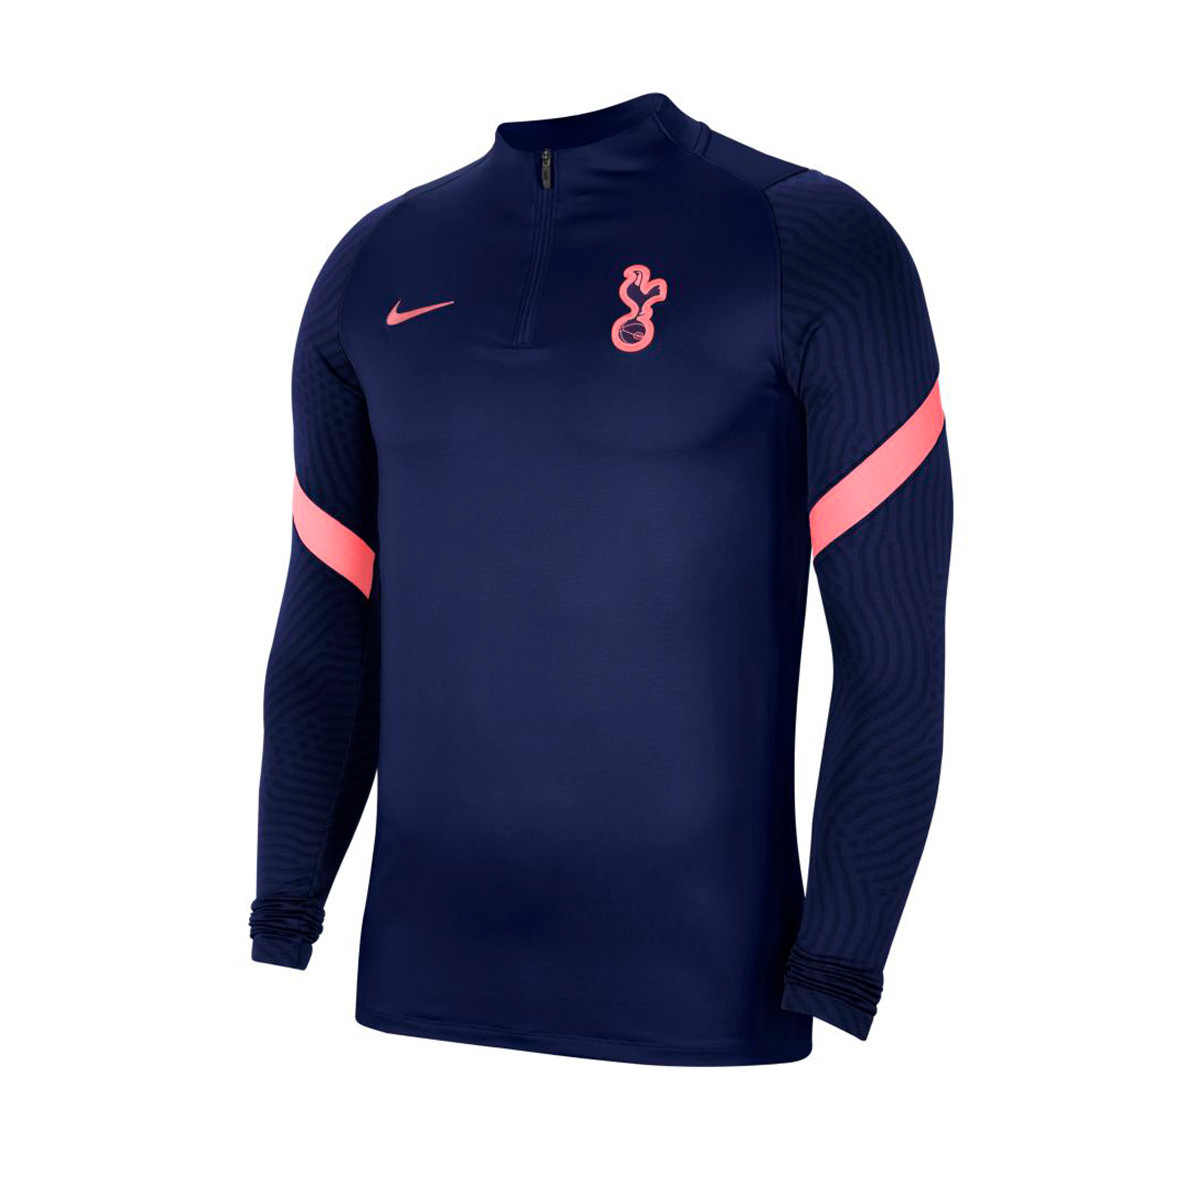 Sweatshirt Nike Tottenham Hotspur Fc Dri Fit Strike Dril Top 2020 2021 Binary Blue Binary Blue Lava Glow Football Store Futbol Emotion